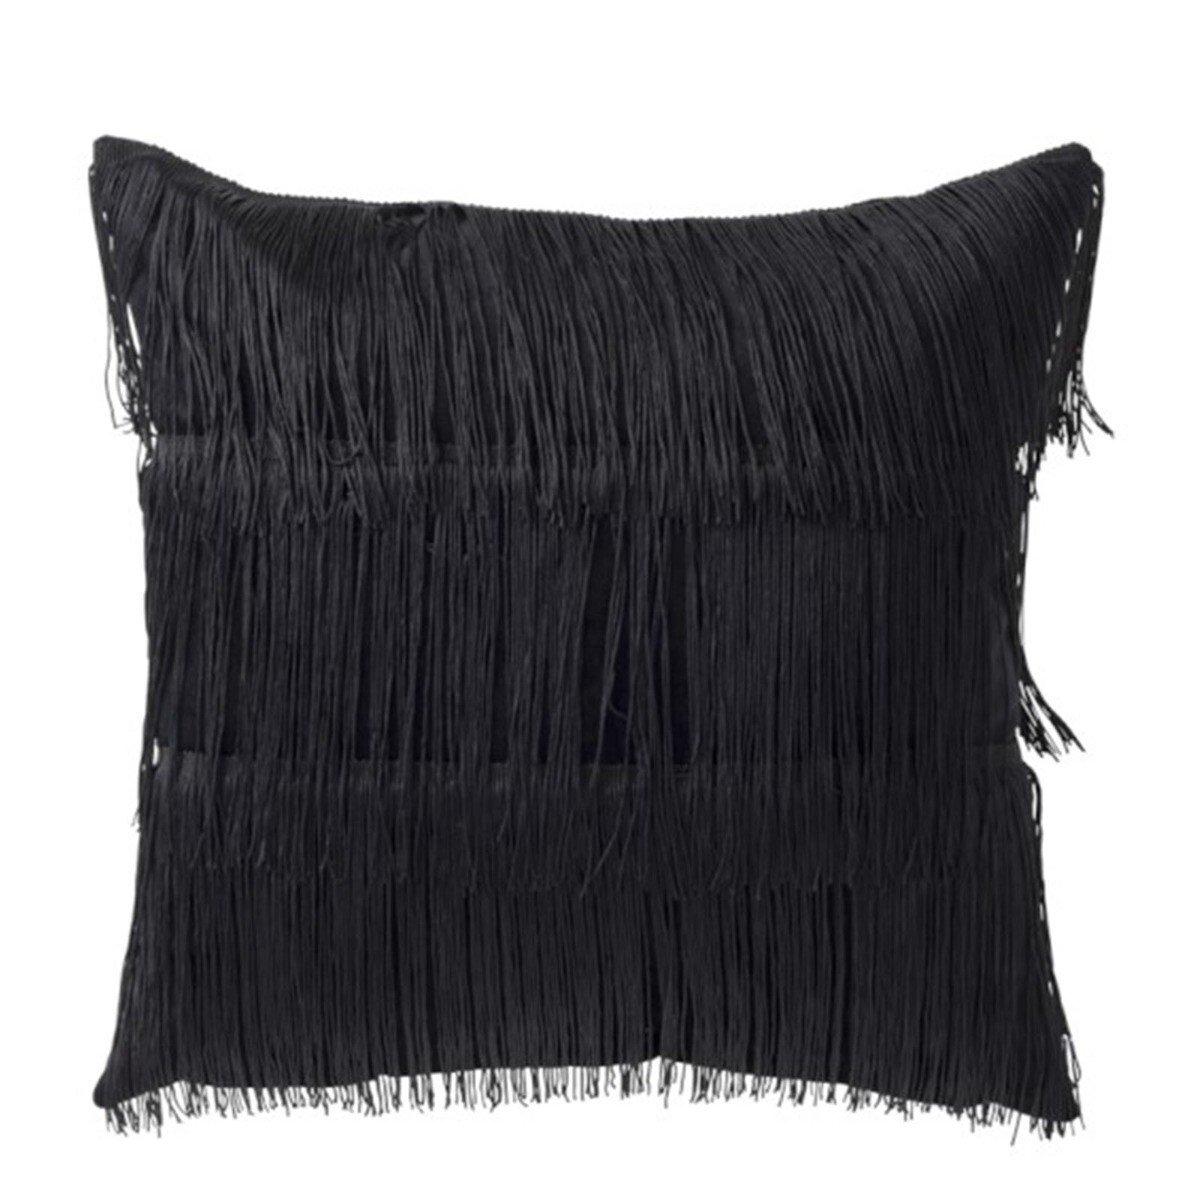 J-Line kussen draden zwart 45 x 45